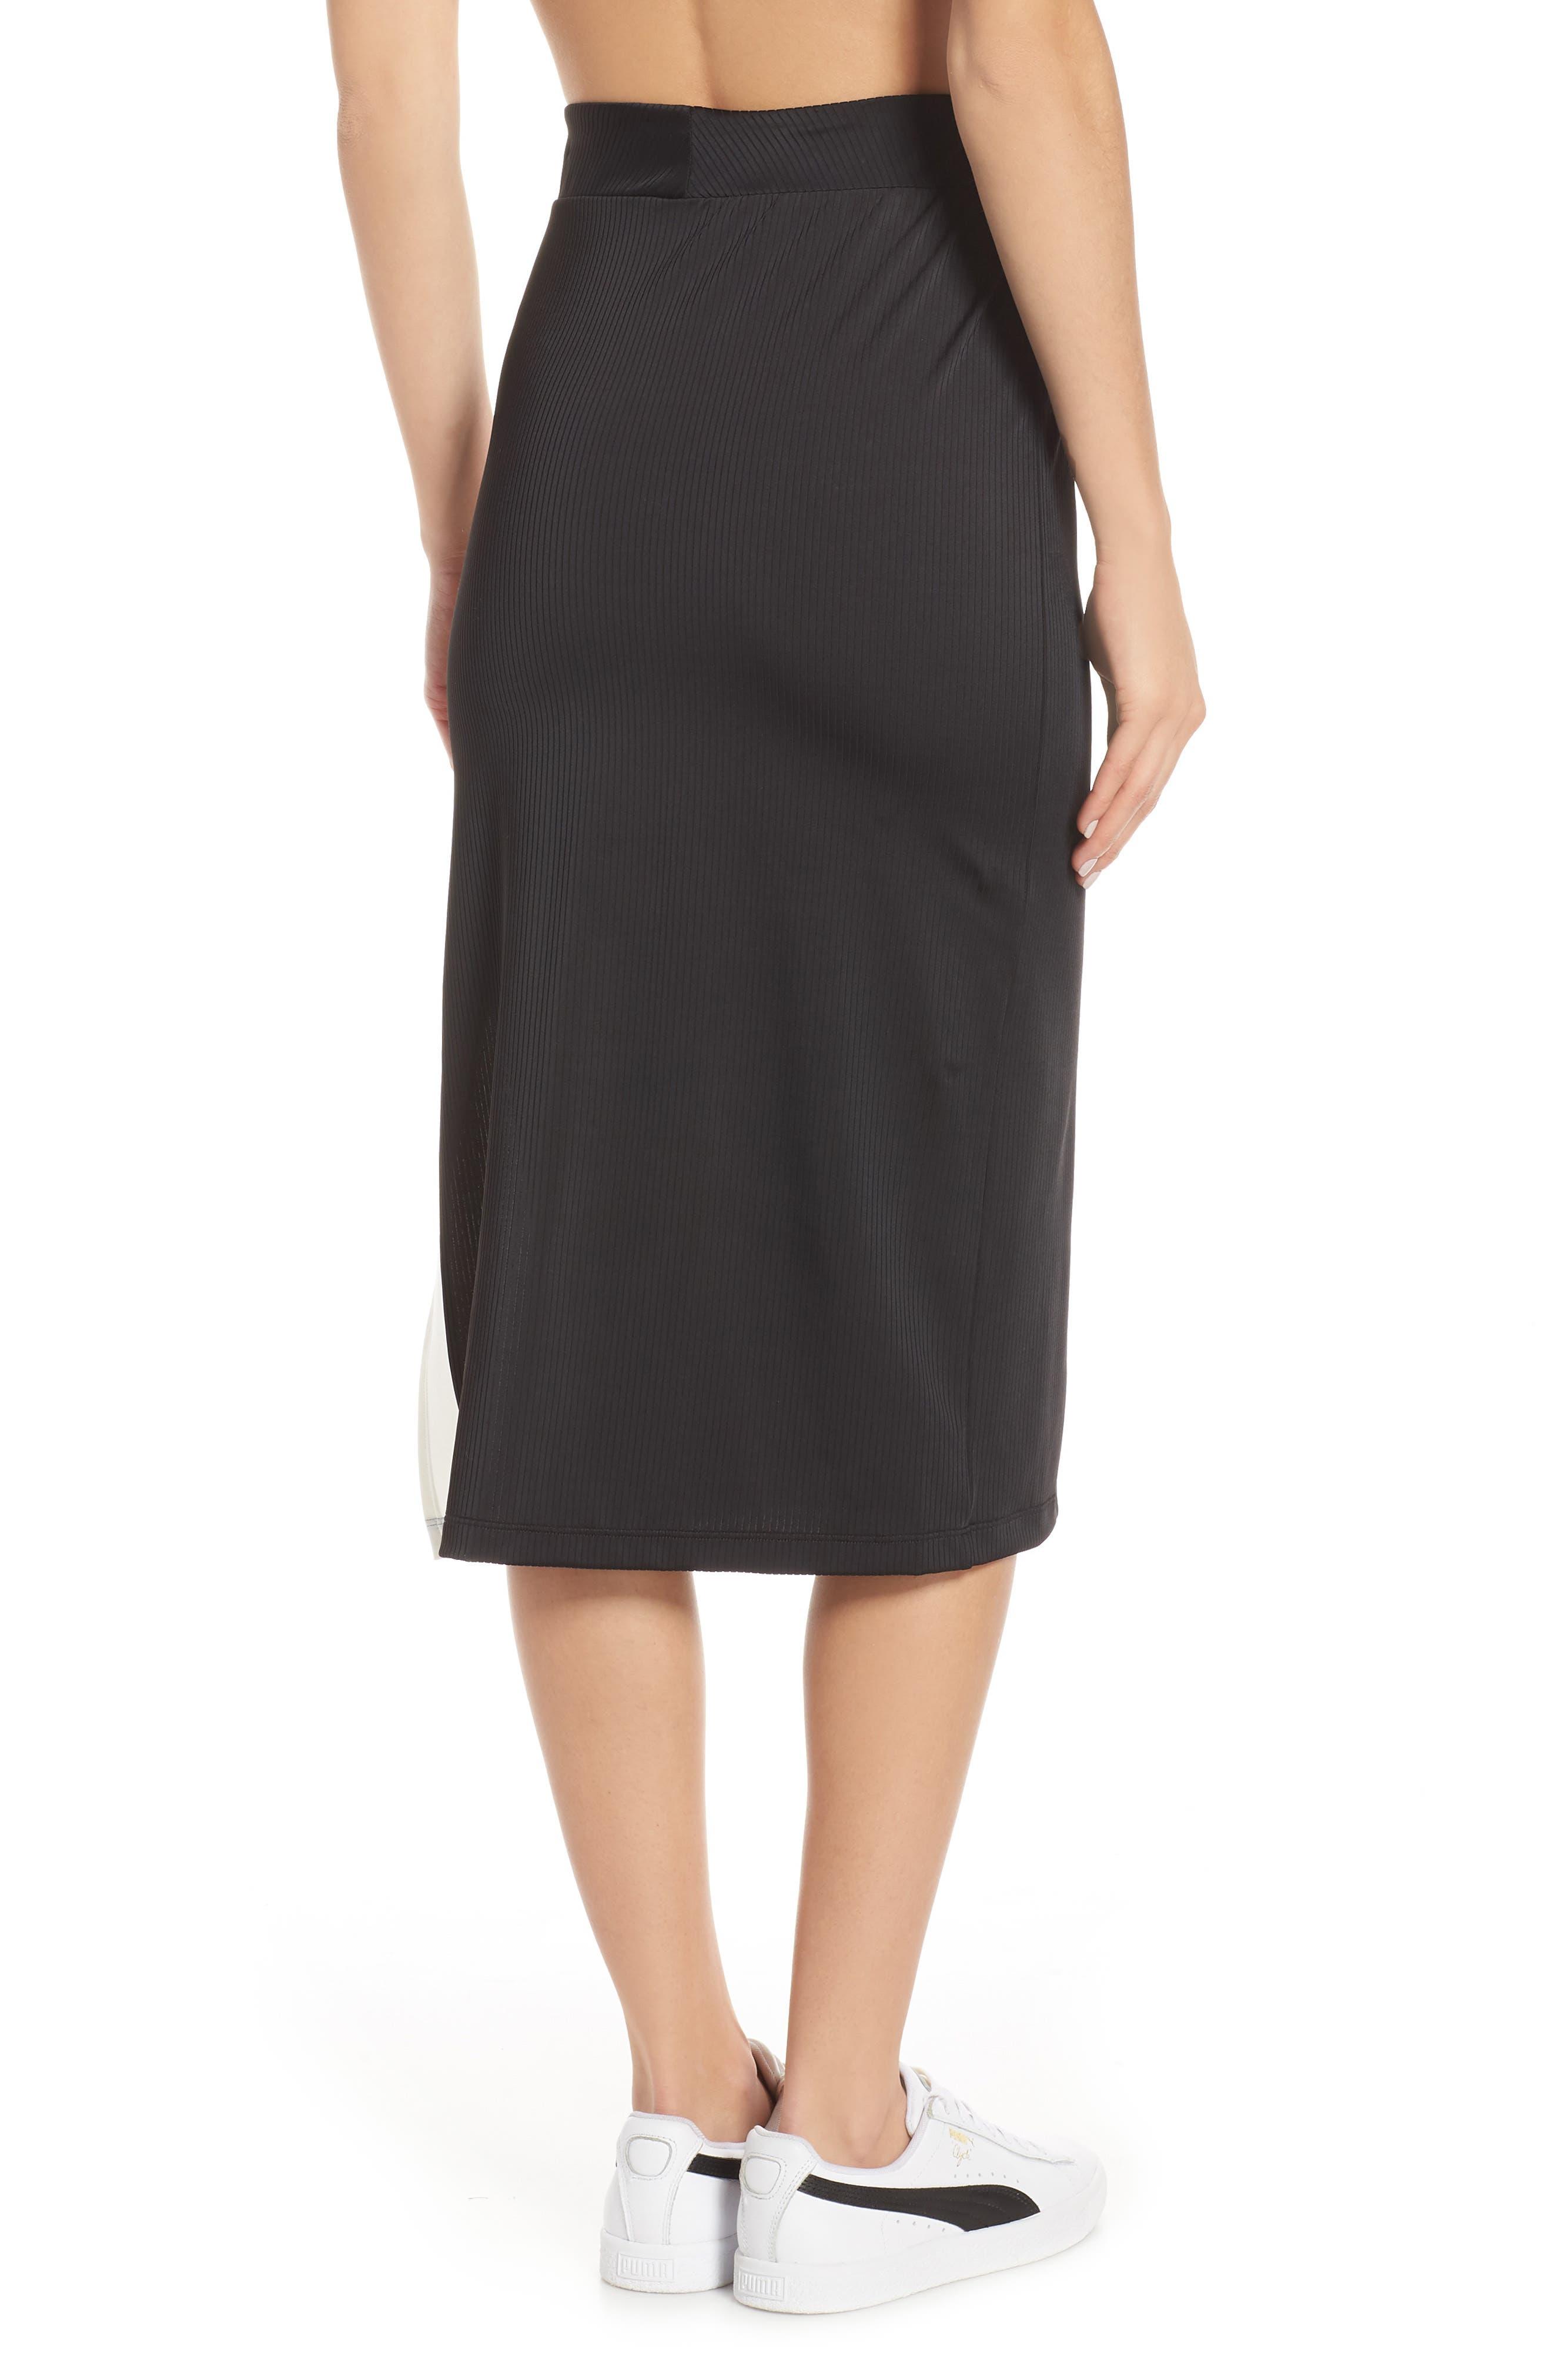 PUMA, Classics Ribbed Skirt, Alternate thumbnail 2, color, 001